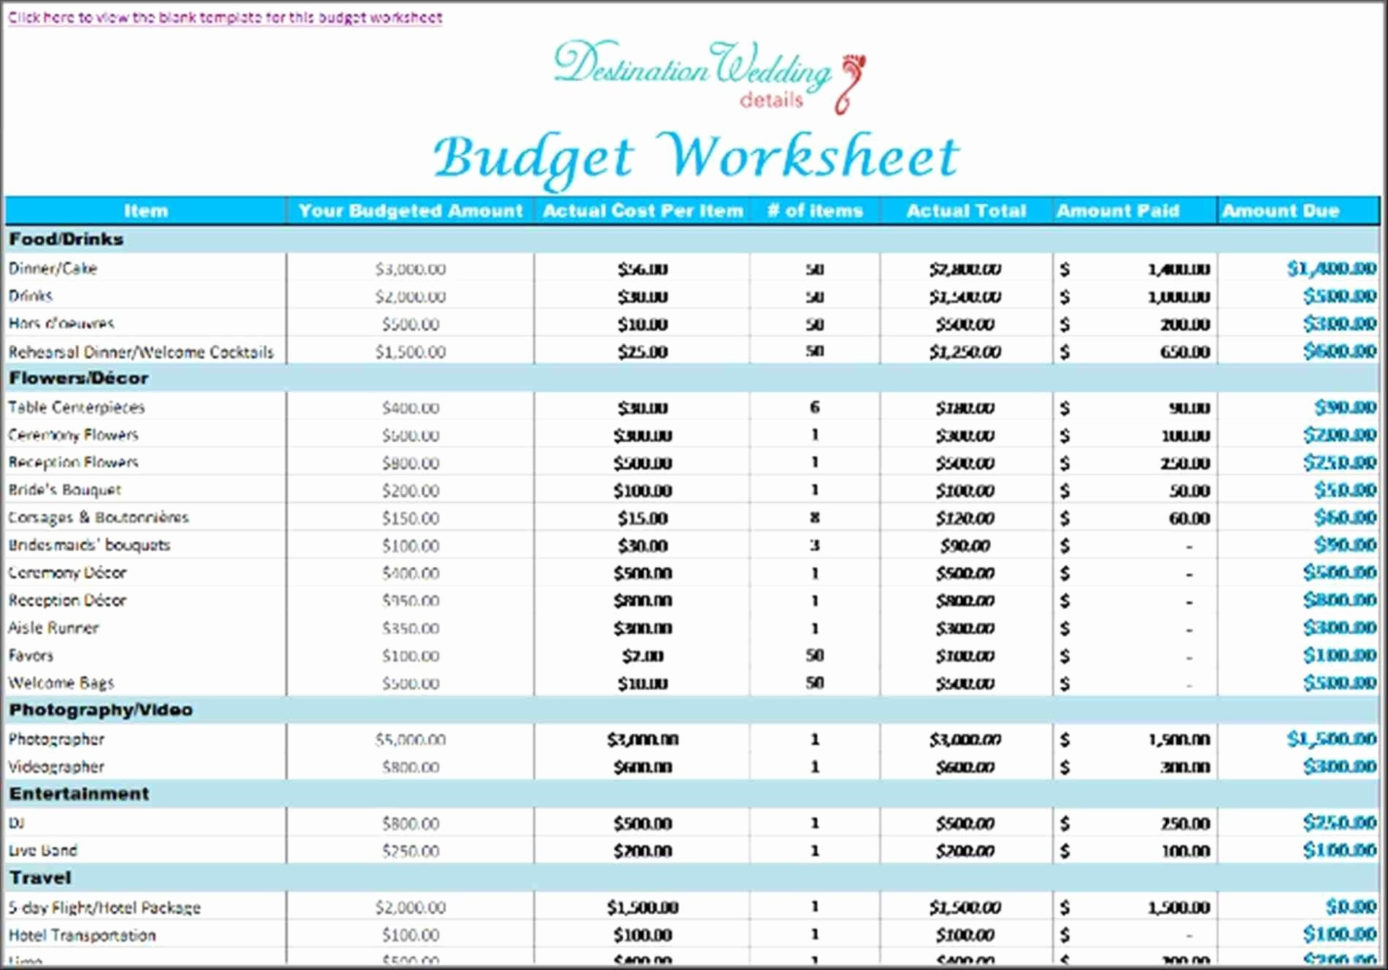 Destination Wedding Budget Spreadsheet Pertaining To Destination Wedding Budget Spreadsheet Elegant Wedding Bud Worksheet